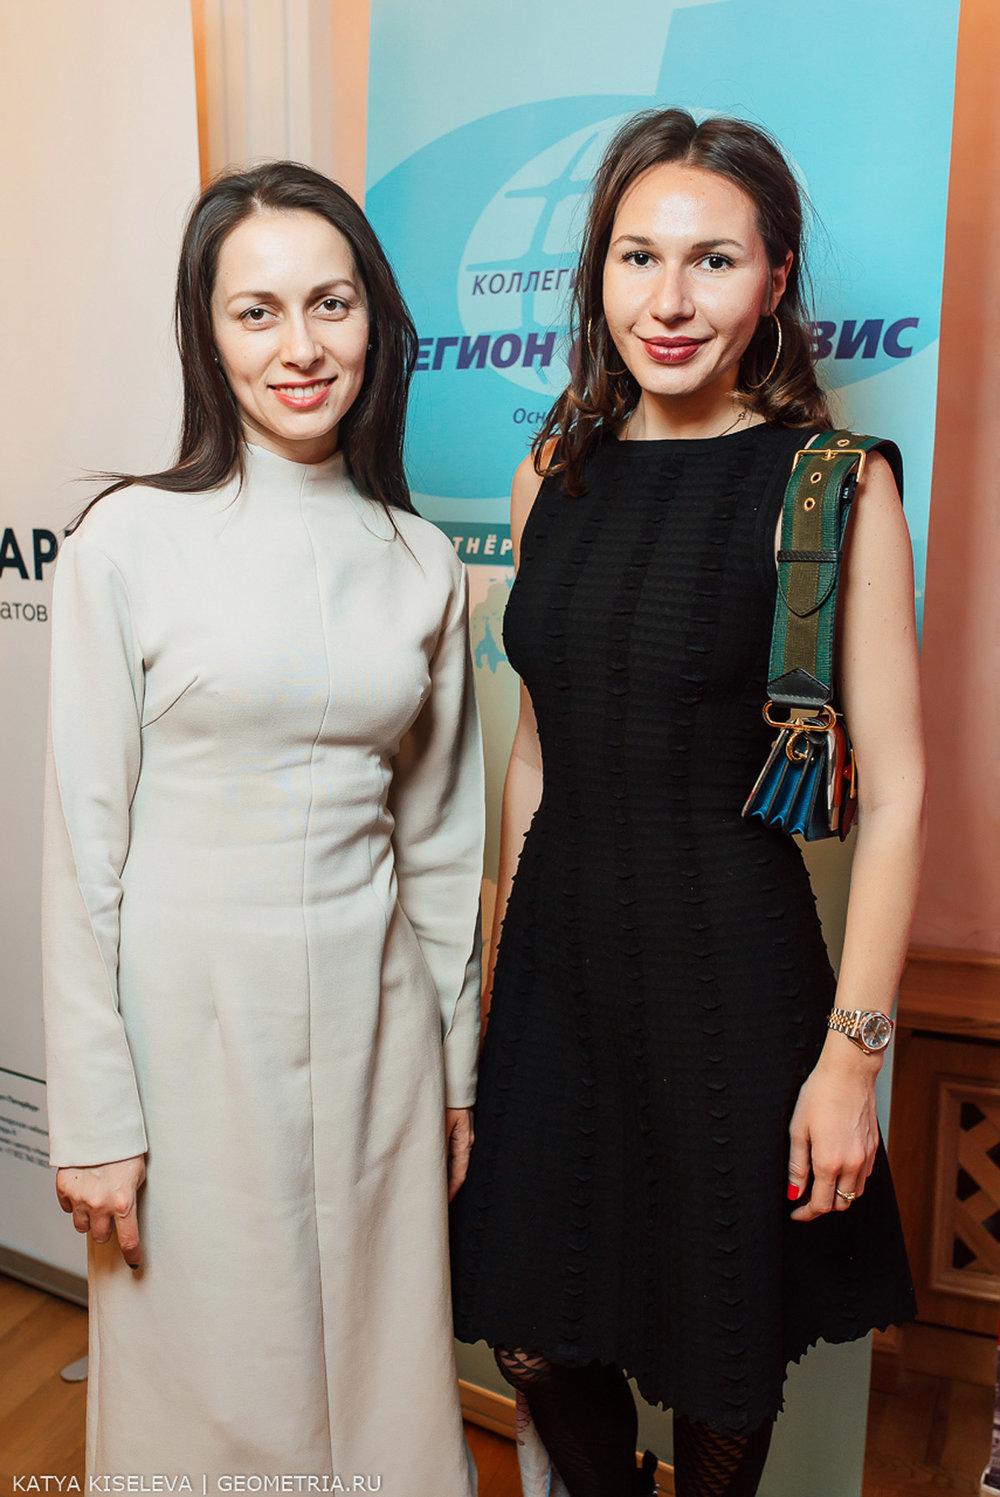 093_2018-02-14_19-09-19_Kiseleva.jpg